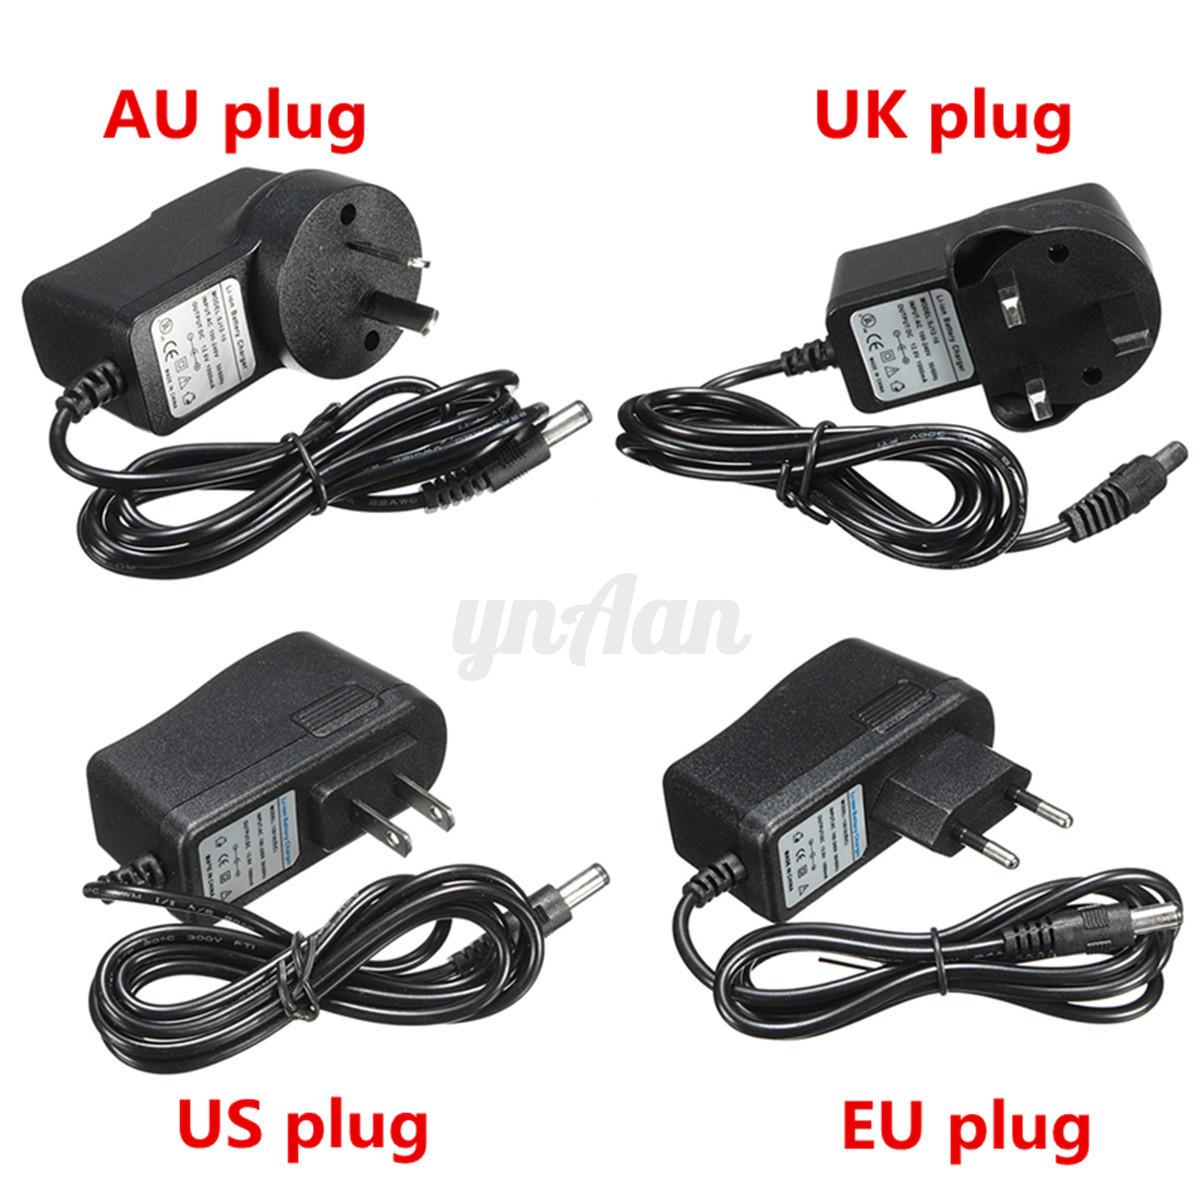 DC 12.6V Battery Rechargeable Charger EU/AU/UK/US Plug For 12.6V Li ...